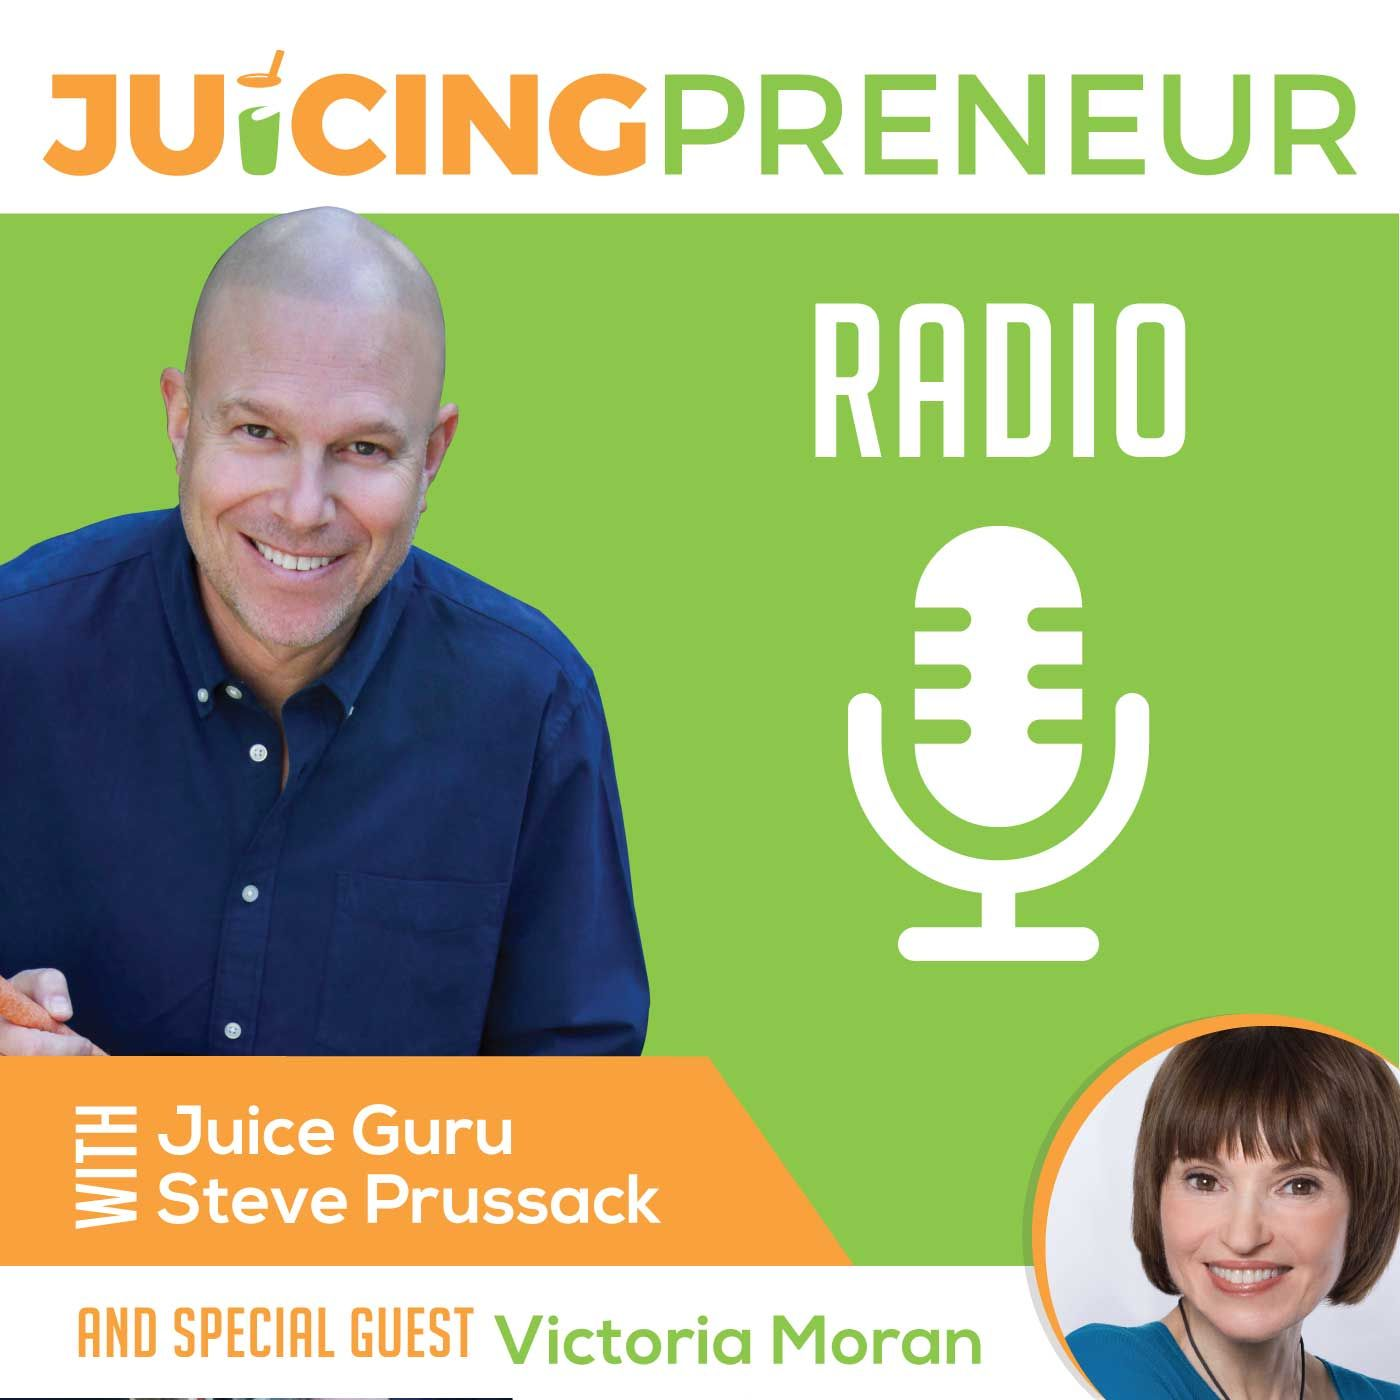 Building Connections with Victoria Moran